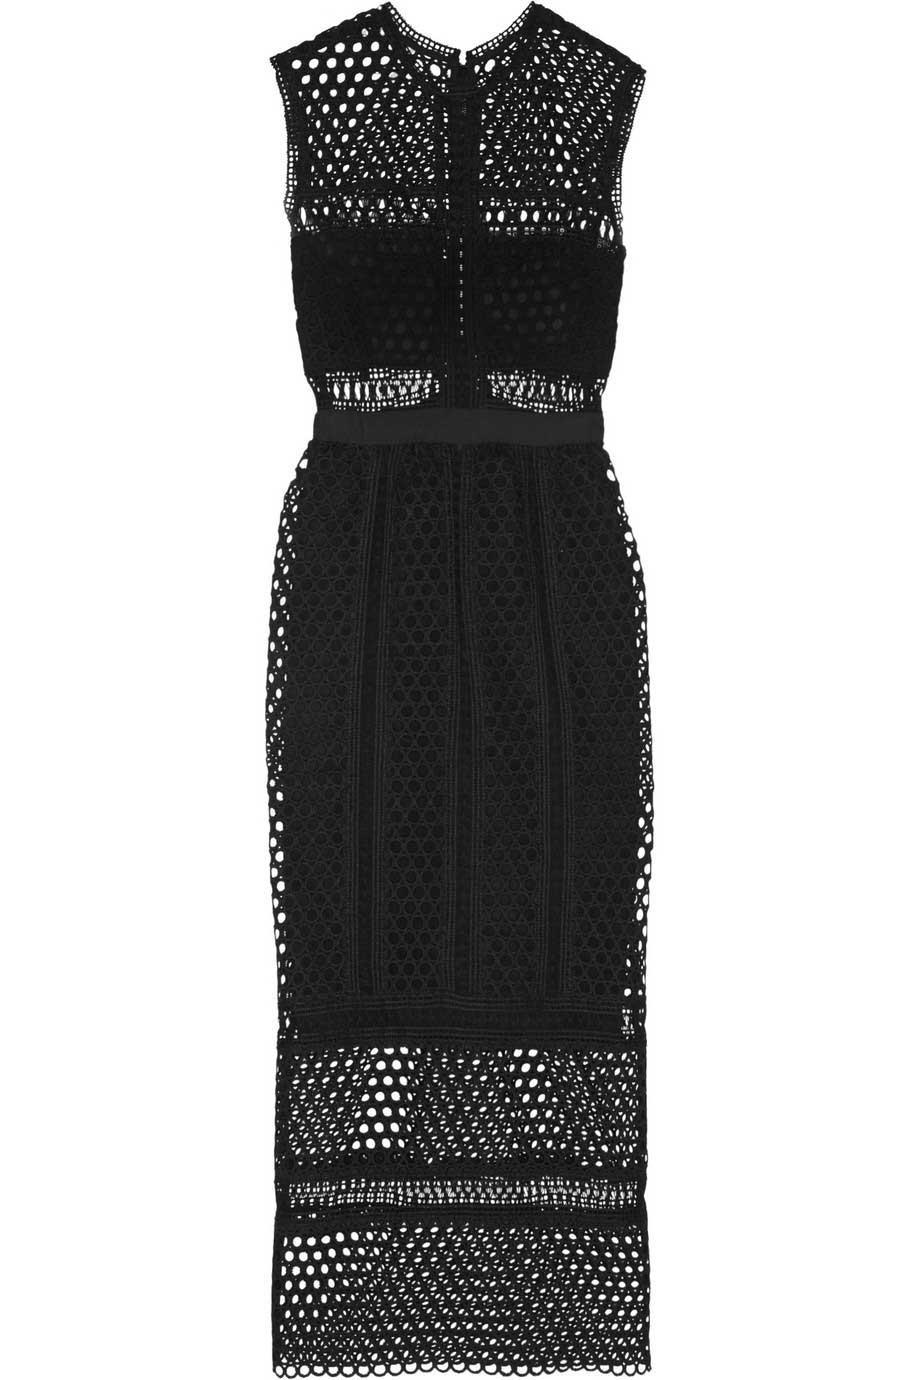 Macrame lace midi dress, £300, Self-Portrait. www.net-a-porter.com